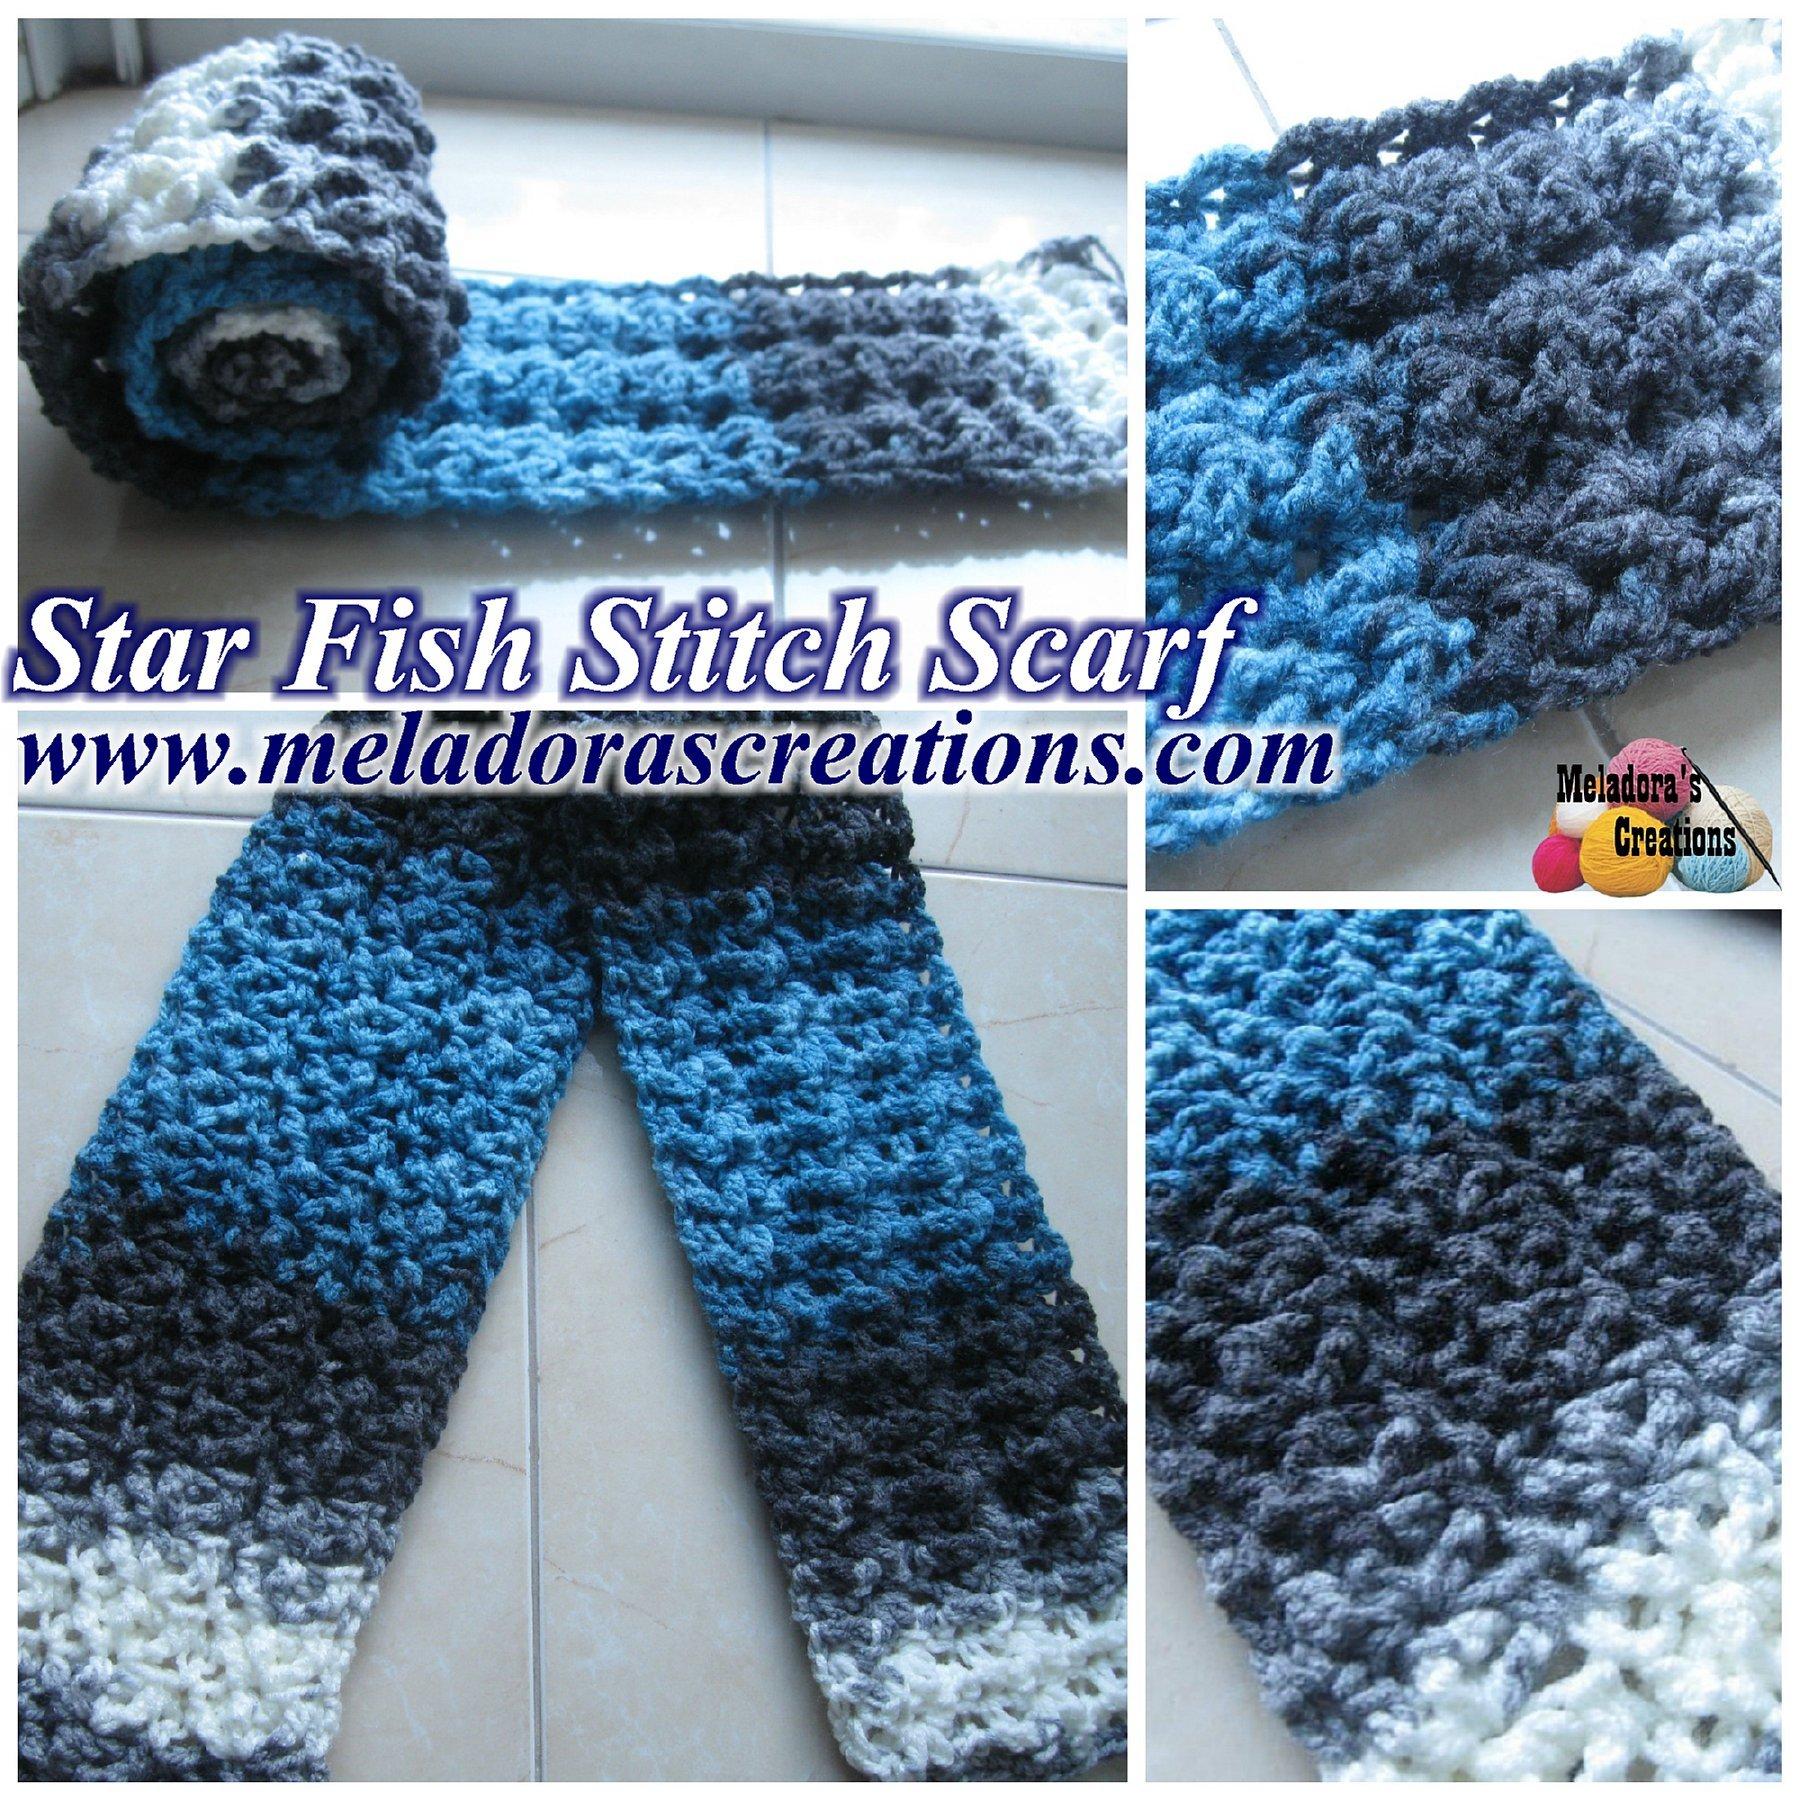 Star Fish Stitch Scarf ~ Meladora's Creations